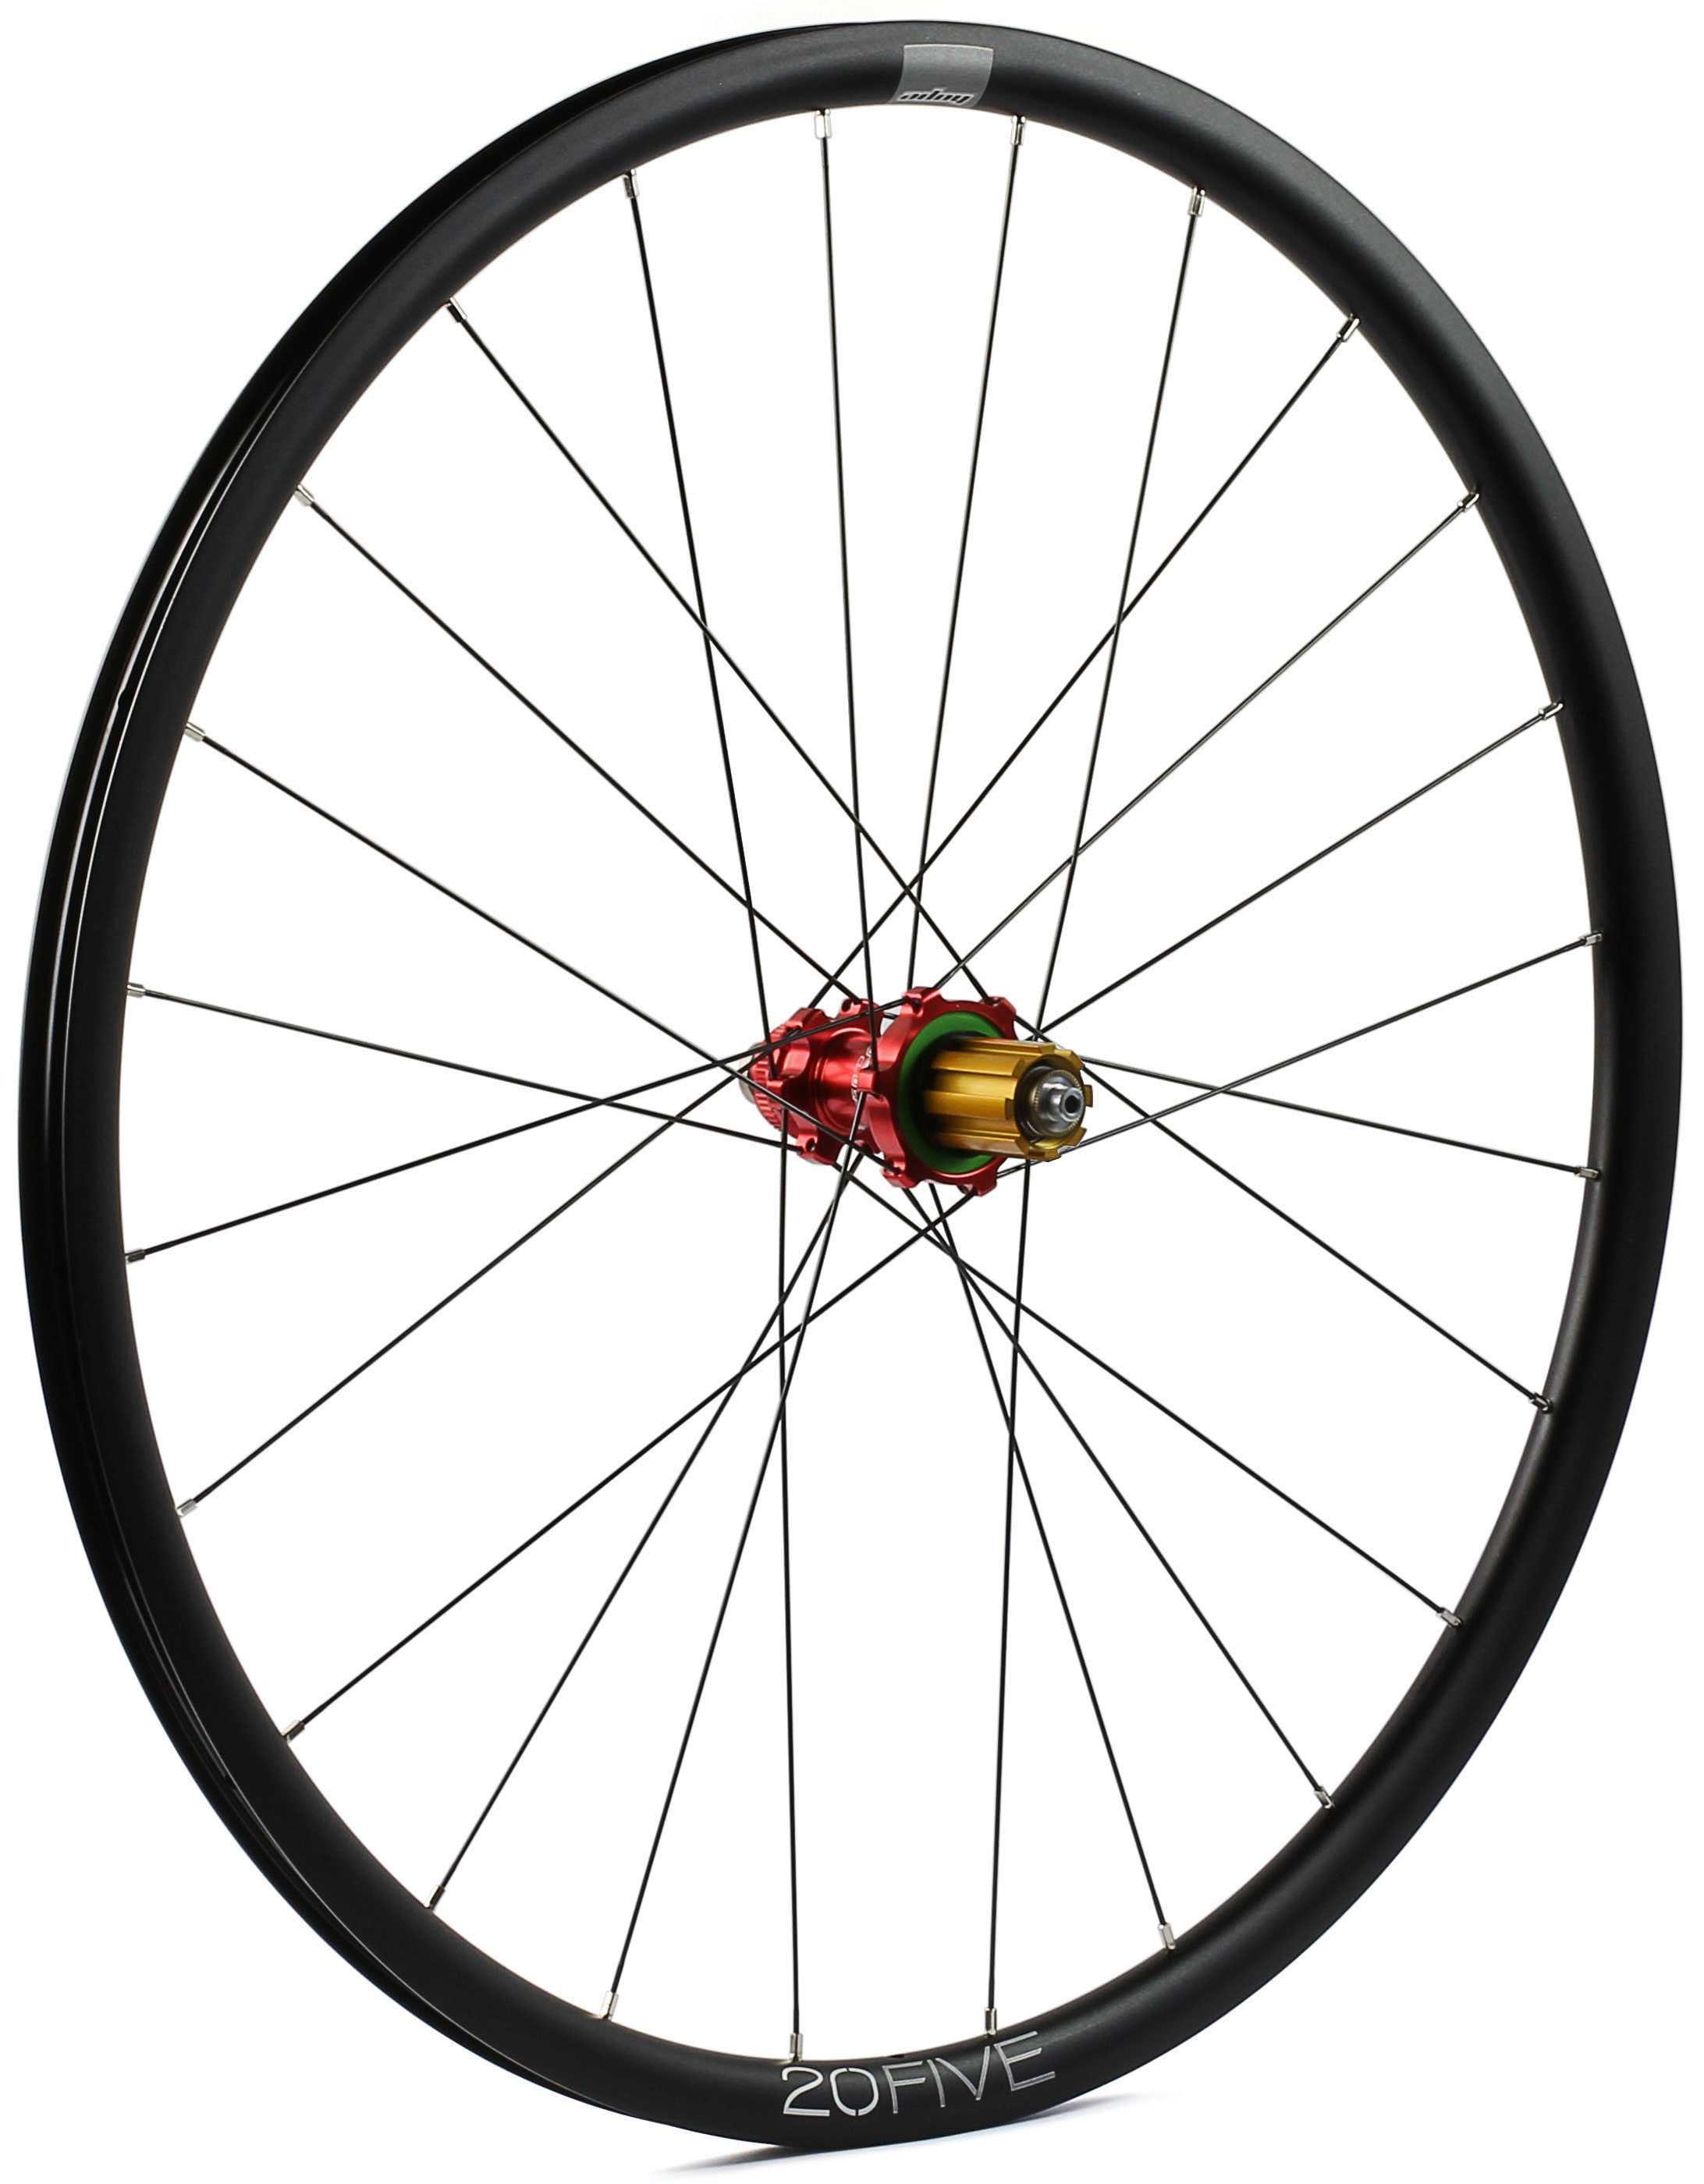 Baghjul Hope 20Five/RS4 Straight Pull kanttråd CL Campagnolo rød | Rear wheel